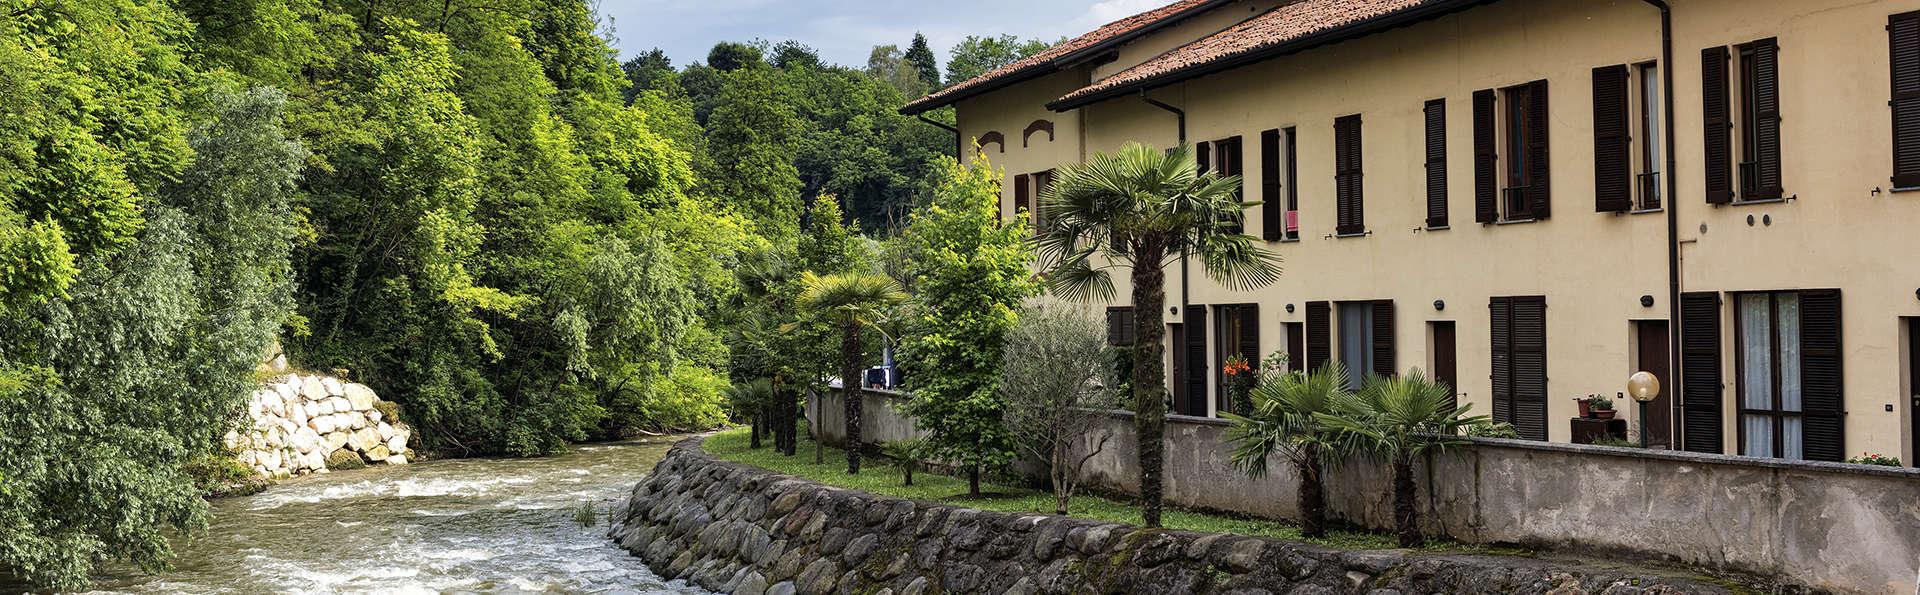 IH Hotels Milano Parco Borromeo Cesano Maderno - Edit_Monza.jpg